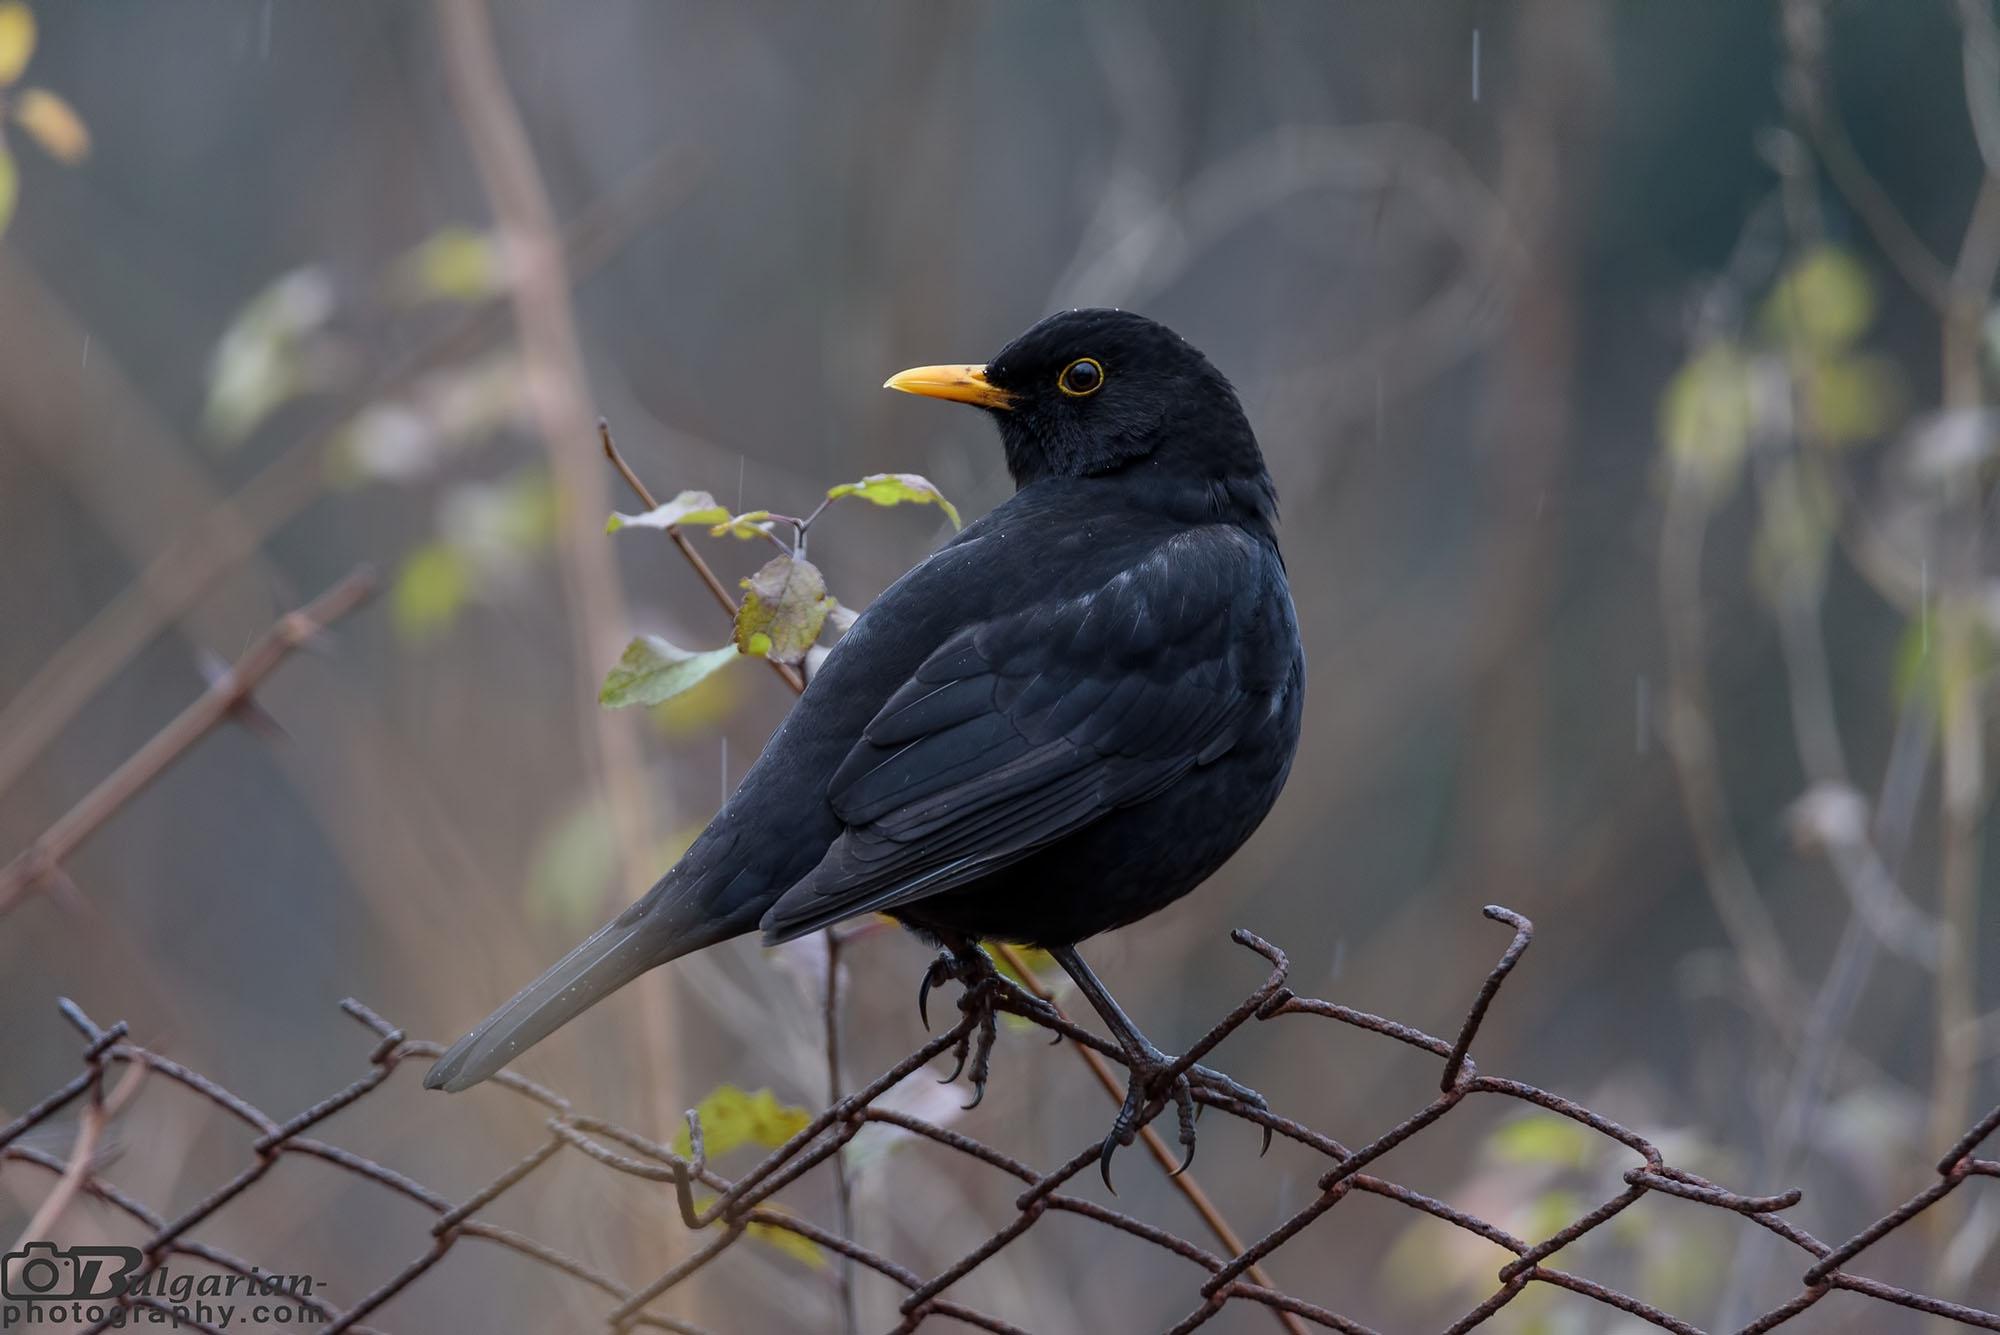 Common blackbird or Eurasian blackbird (Turdus merula)